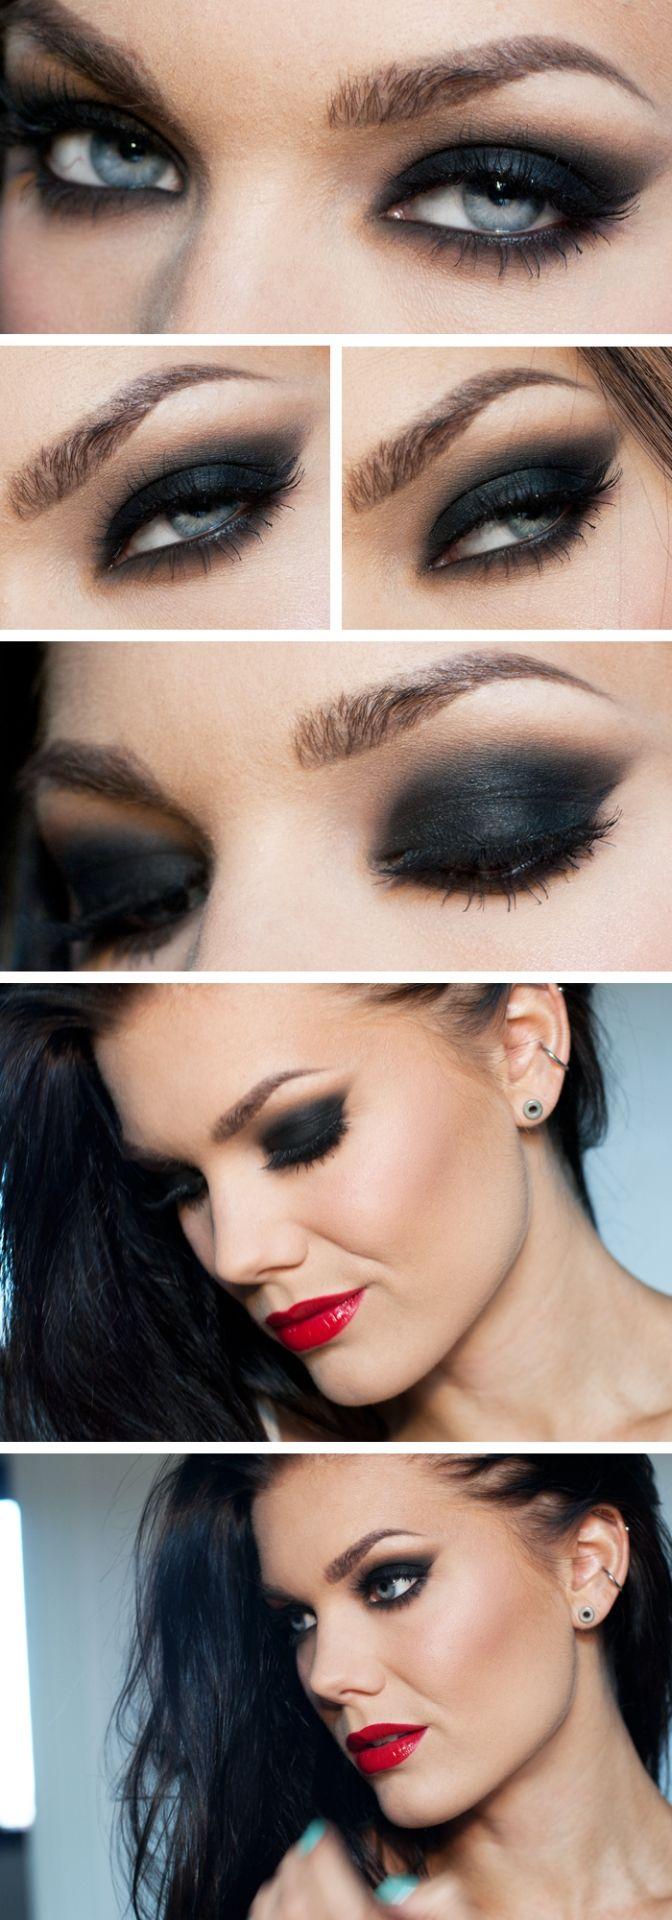 lindahallberg : black smokey cat eye, glossy red lips  - dramatic evening makeup